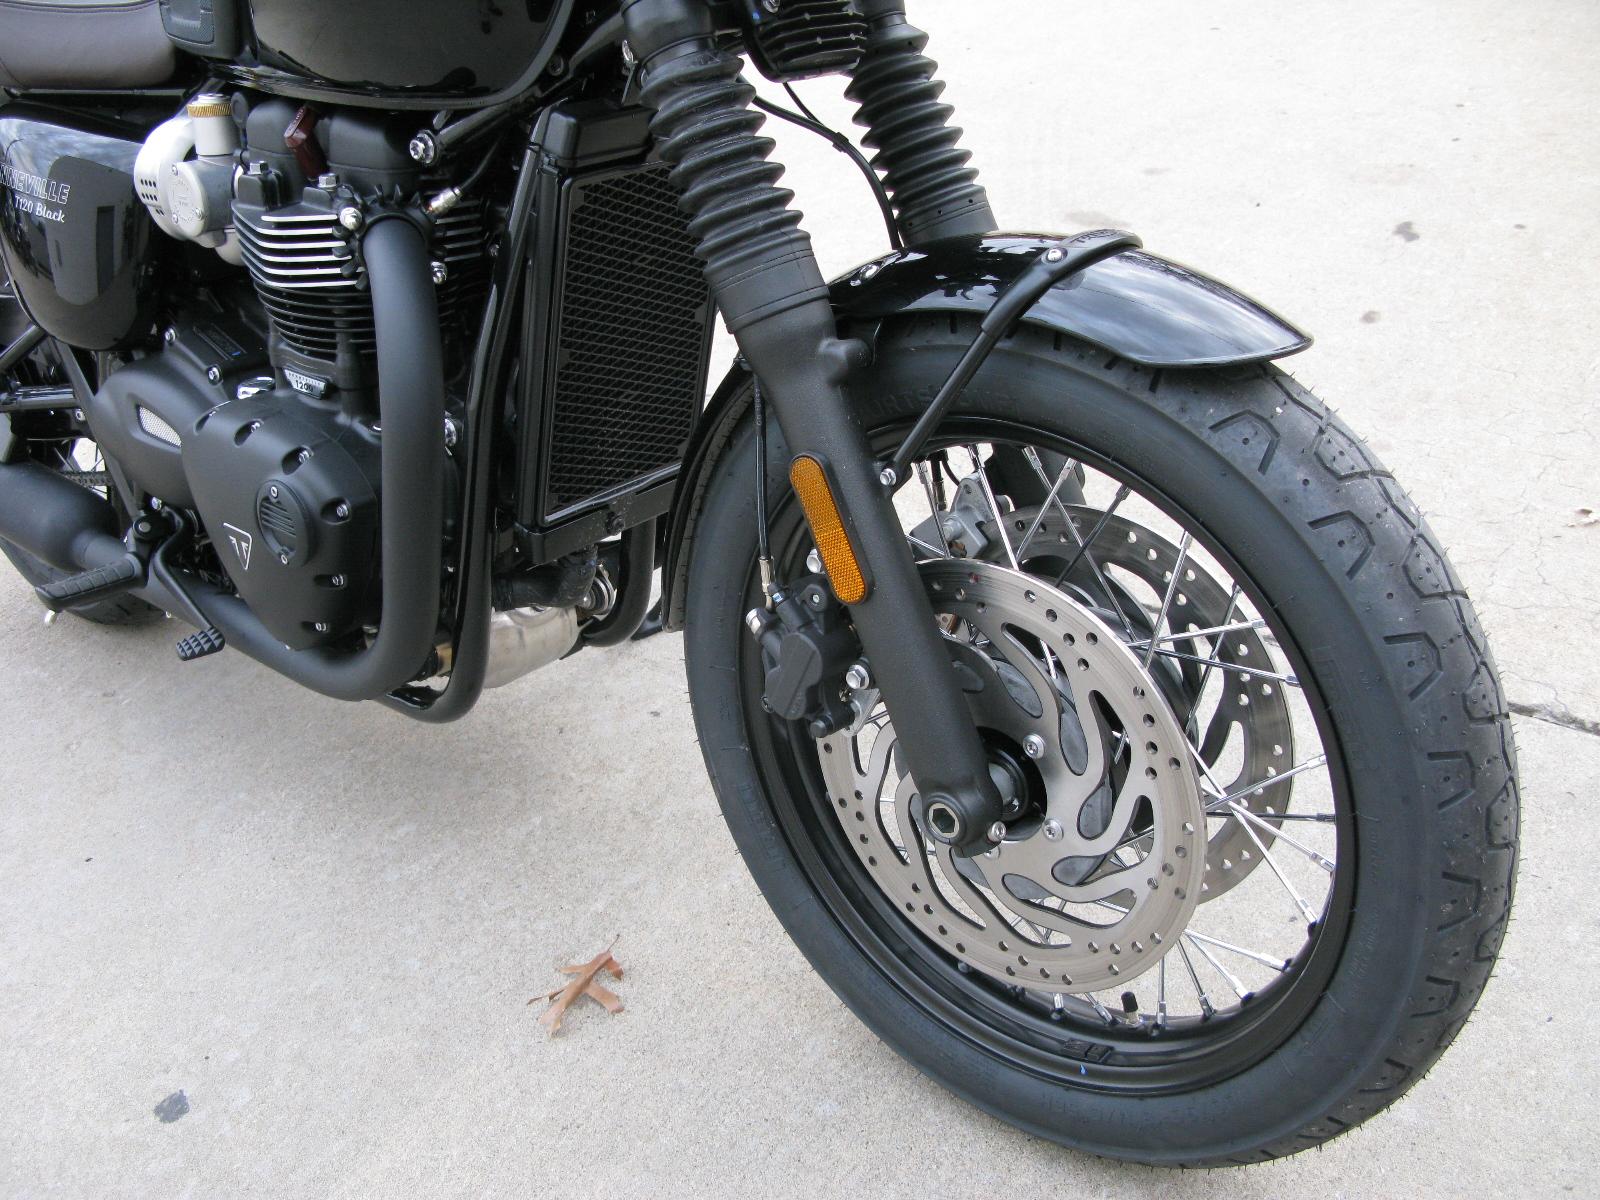 2020 Triumph Bonneville T120 Black For Sale In Kansas City Mo Engle Motors Kansas City Mo 816 241 7554